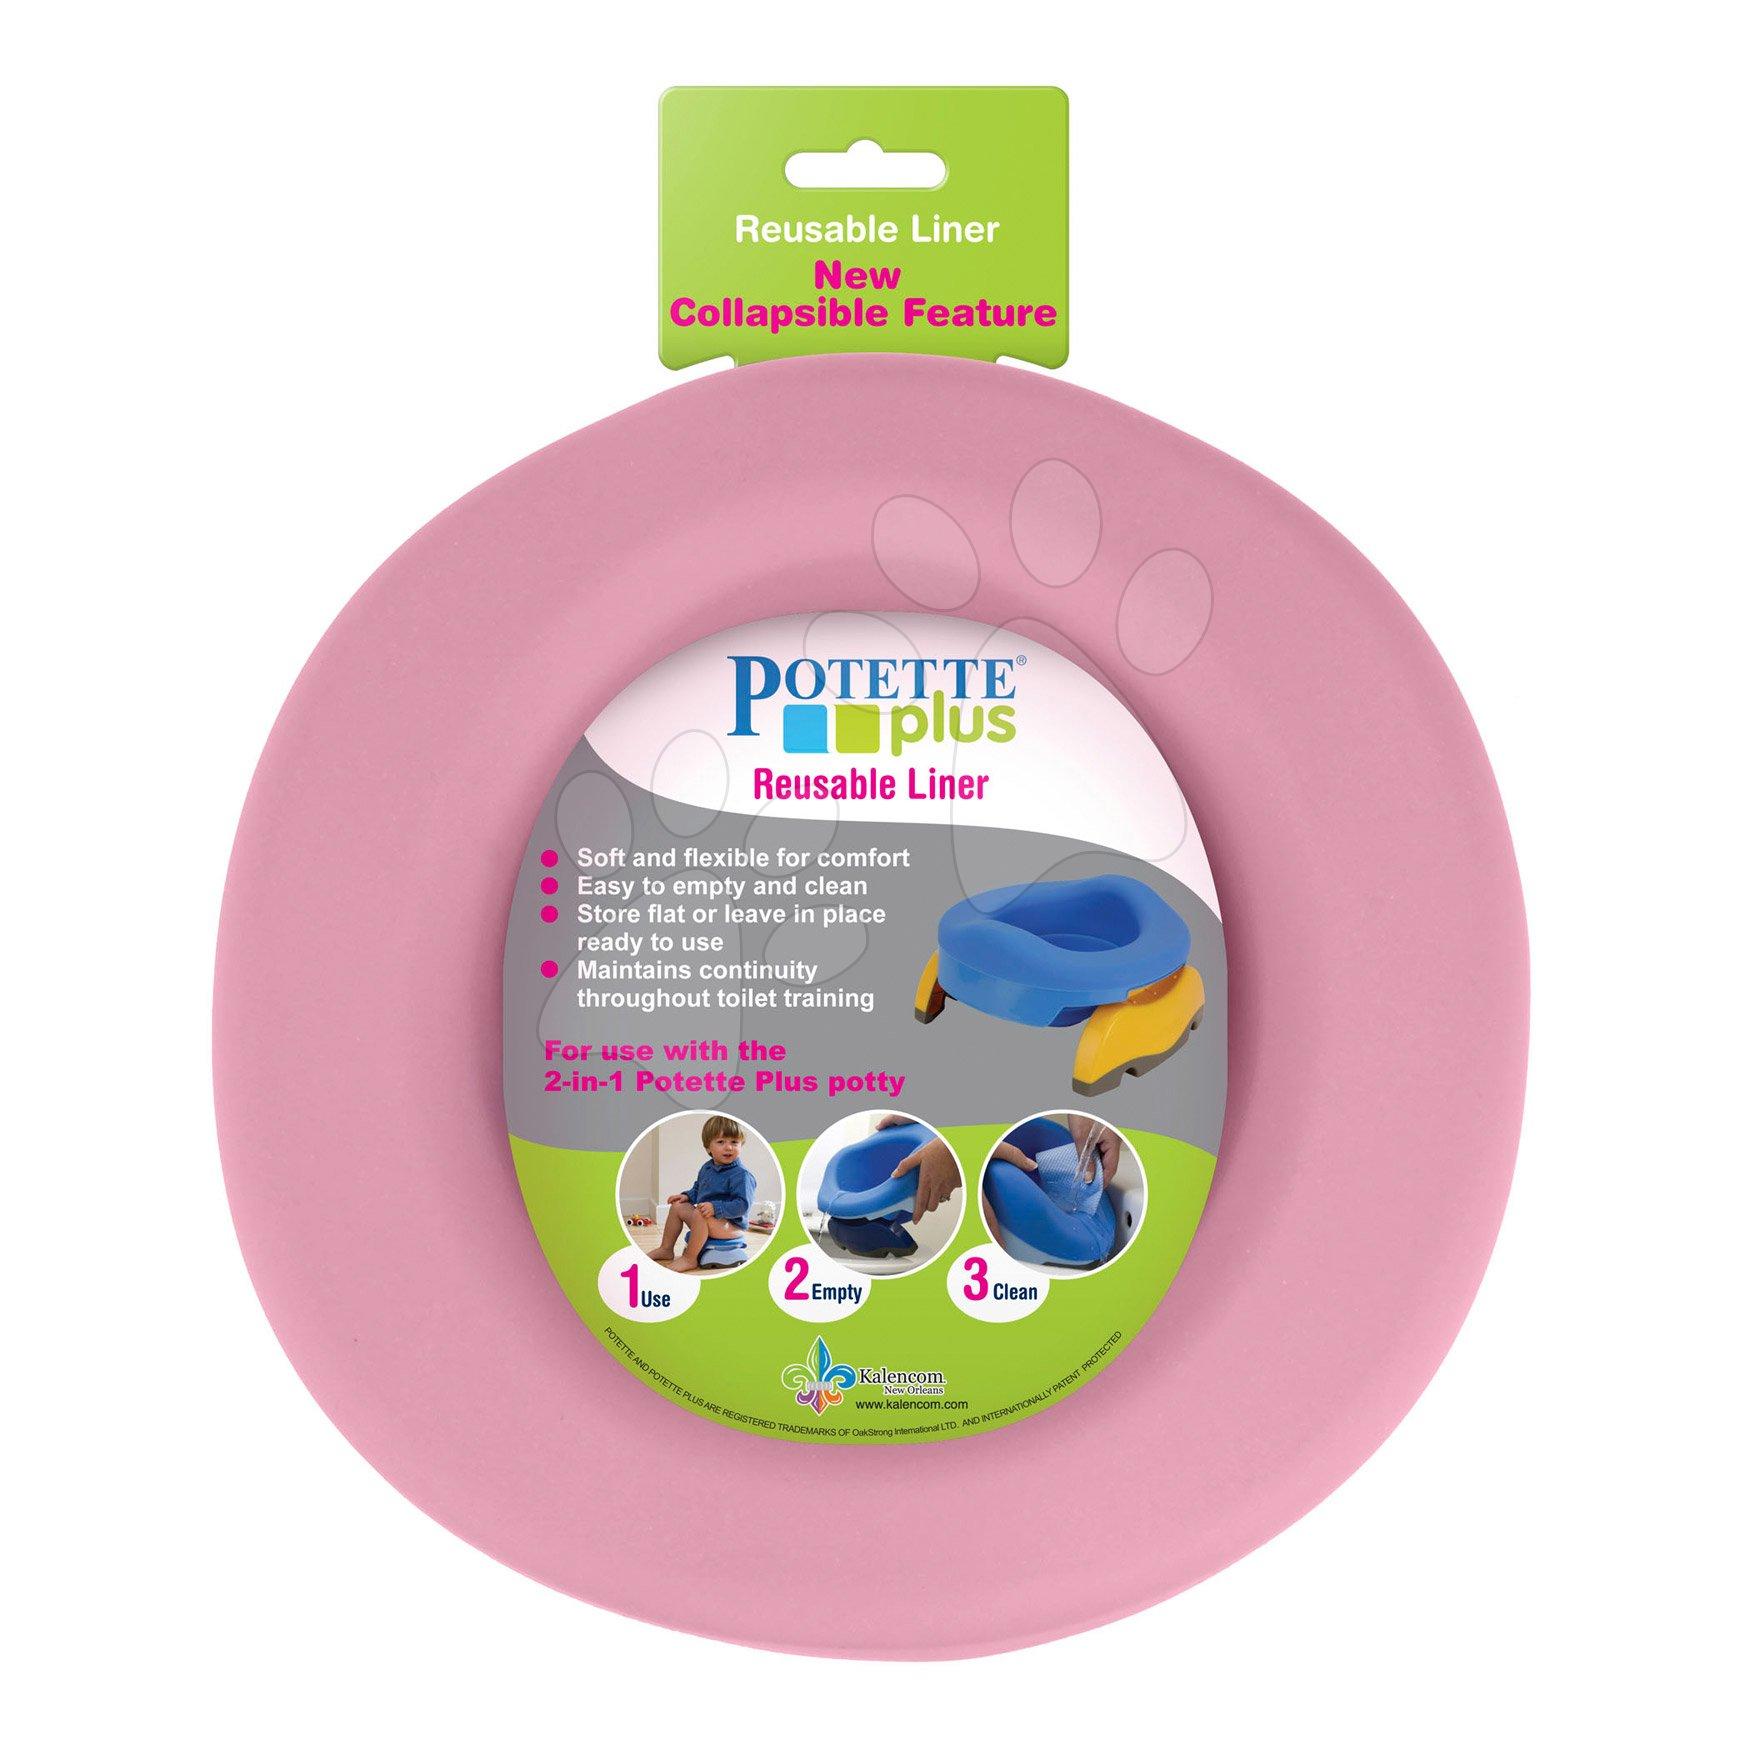 Nočníky a redukcie na toaletu - Vložka do detského nočníka Potette Plus gumená ružová